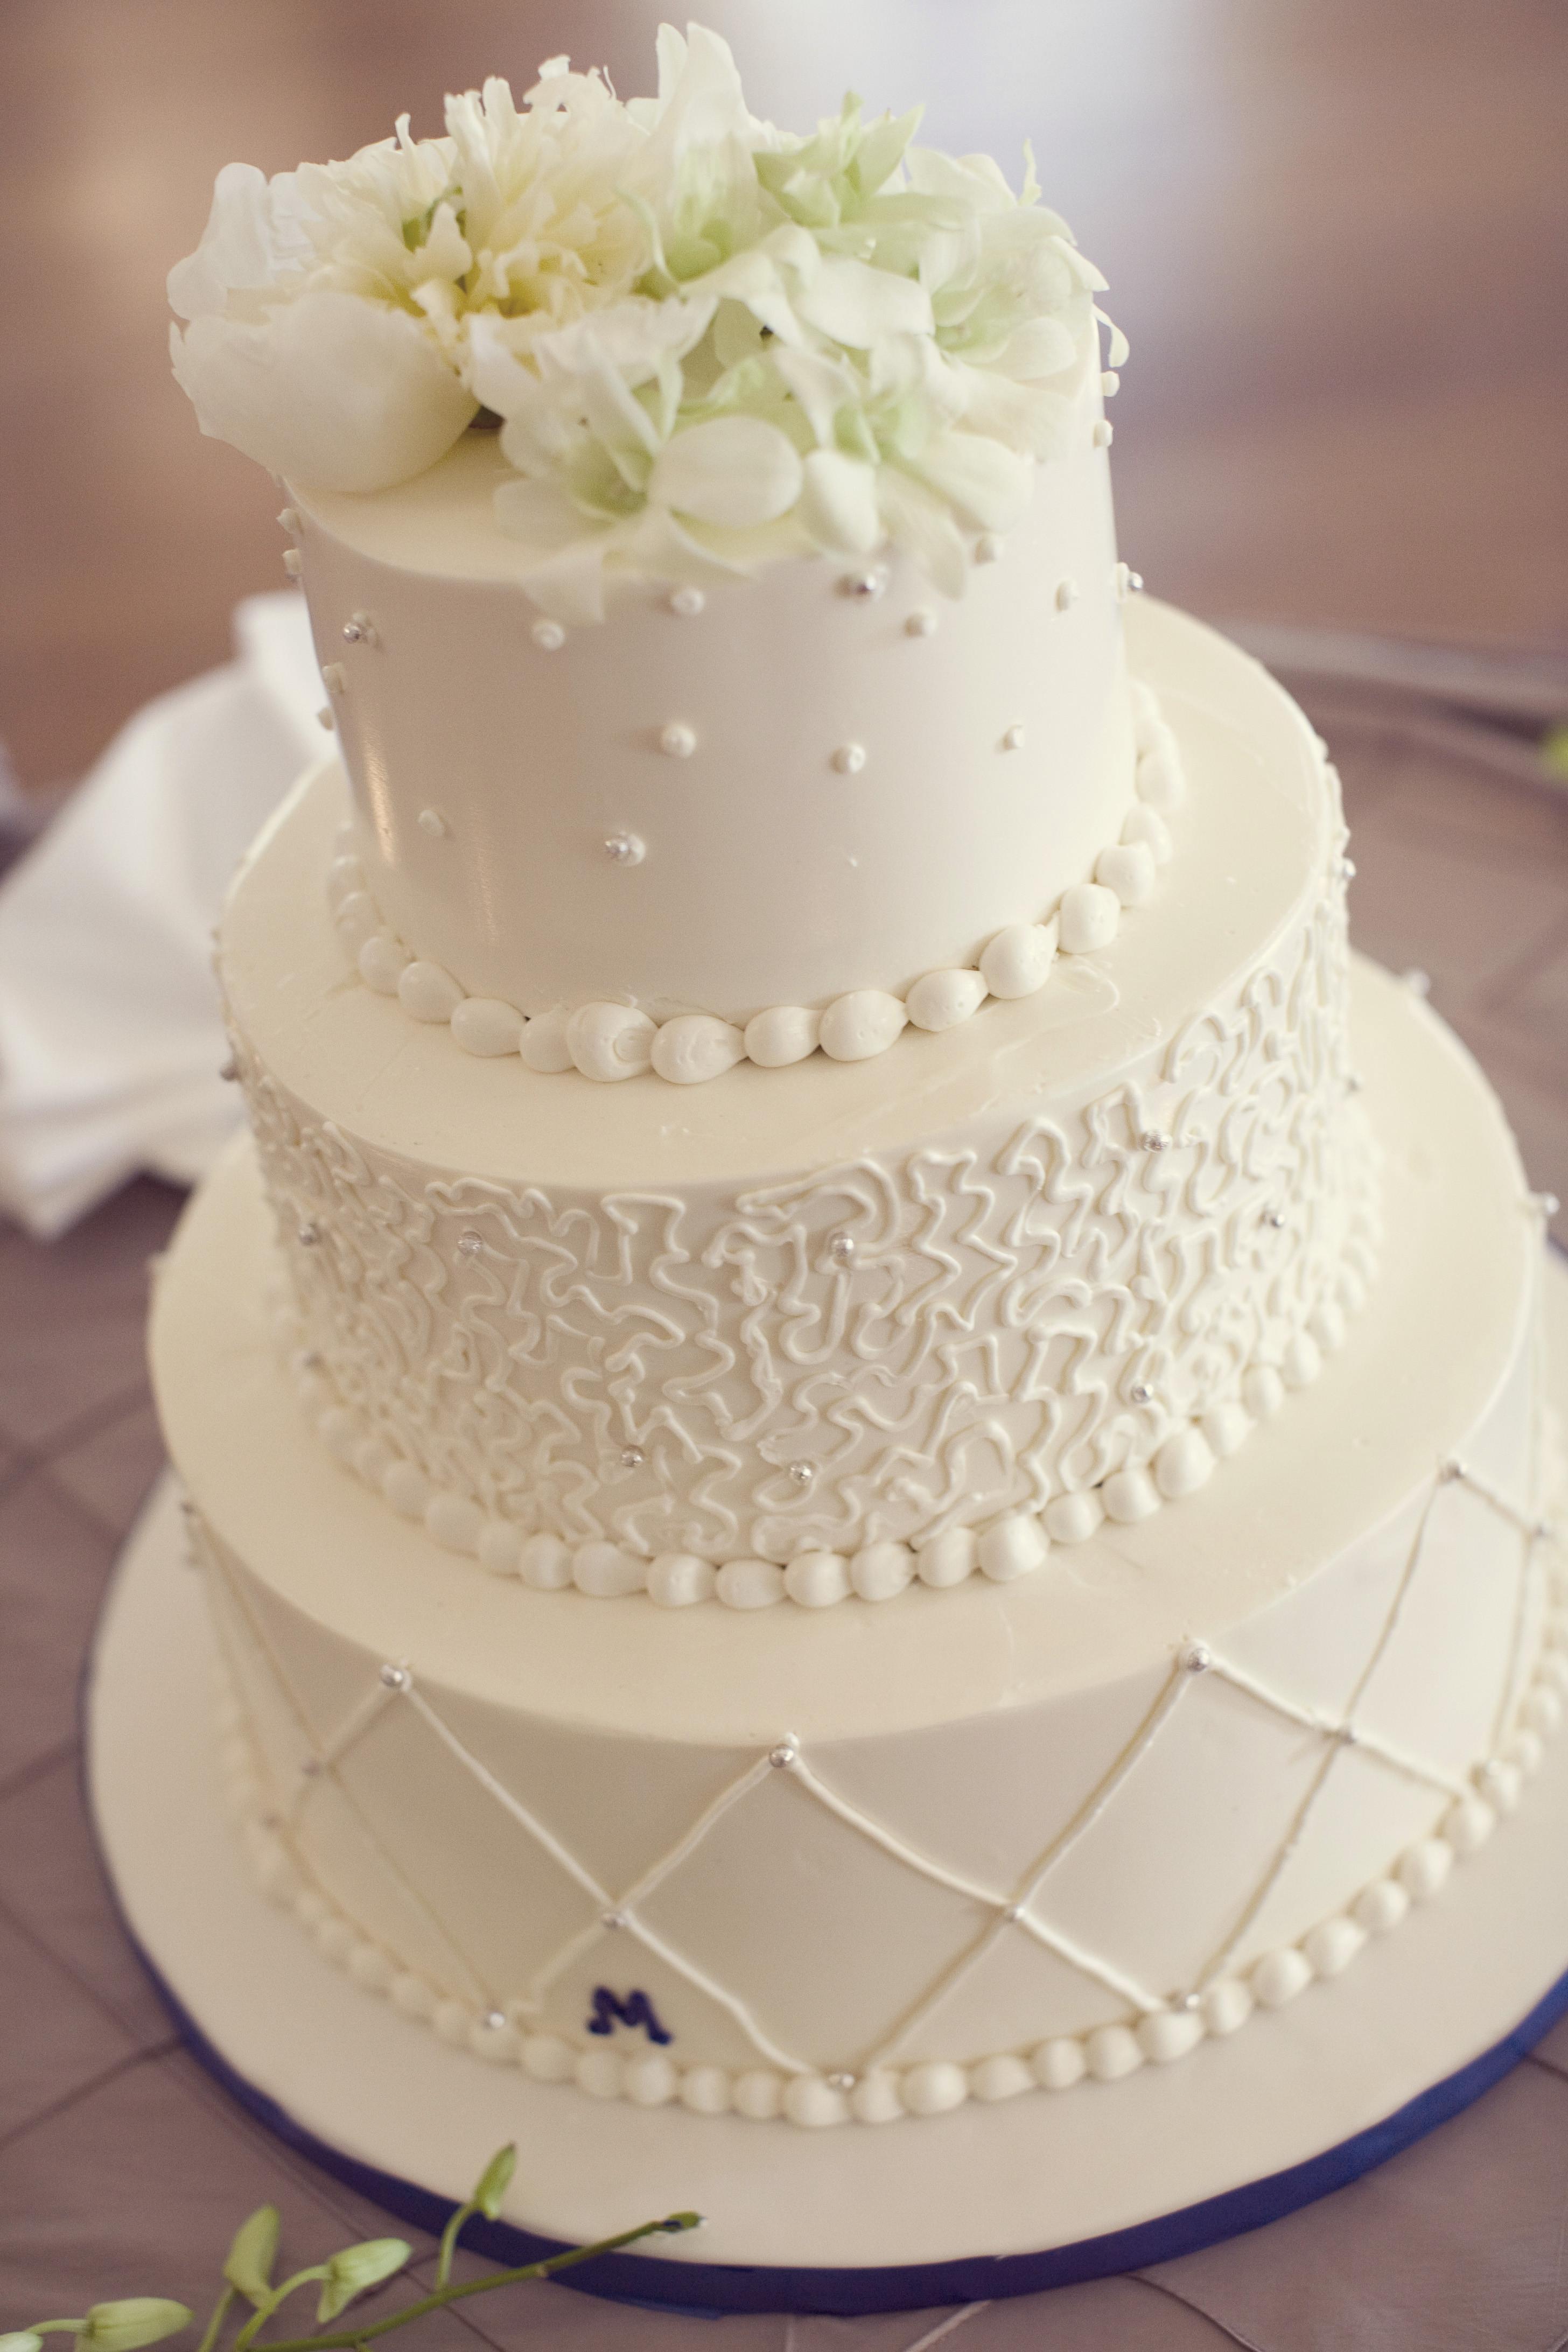 Icing For Wedding Cakes  Wedding Cake Frosting Recipe — Dishmaps